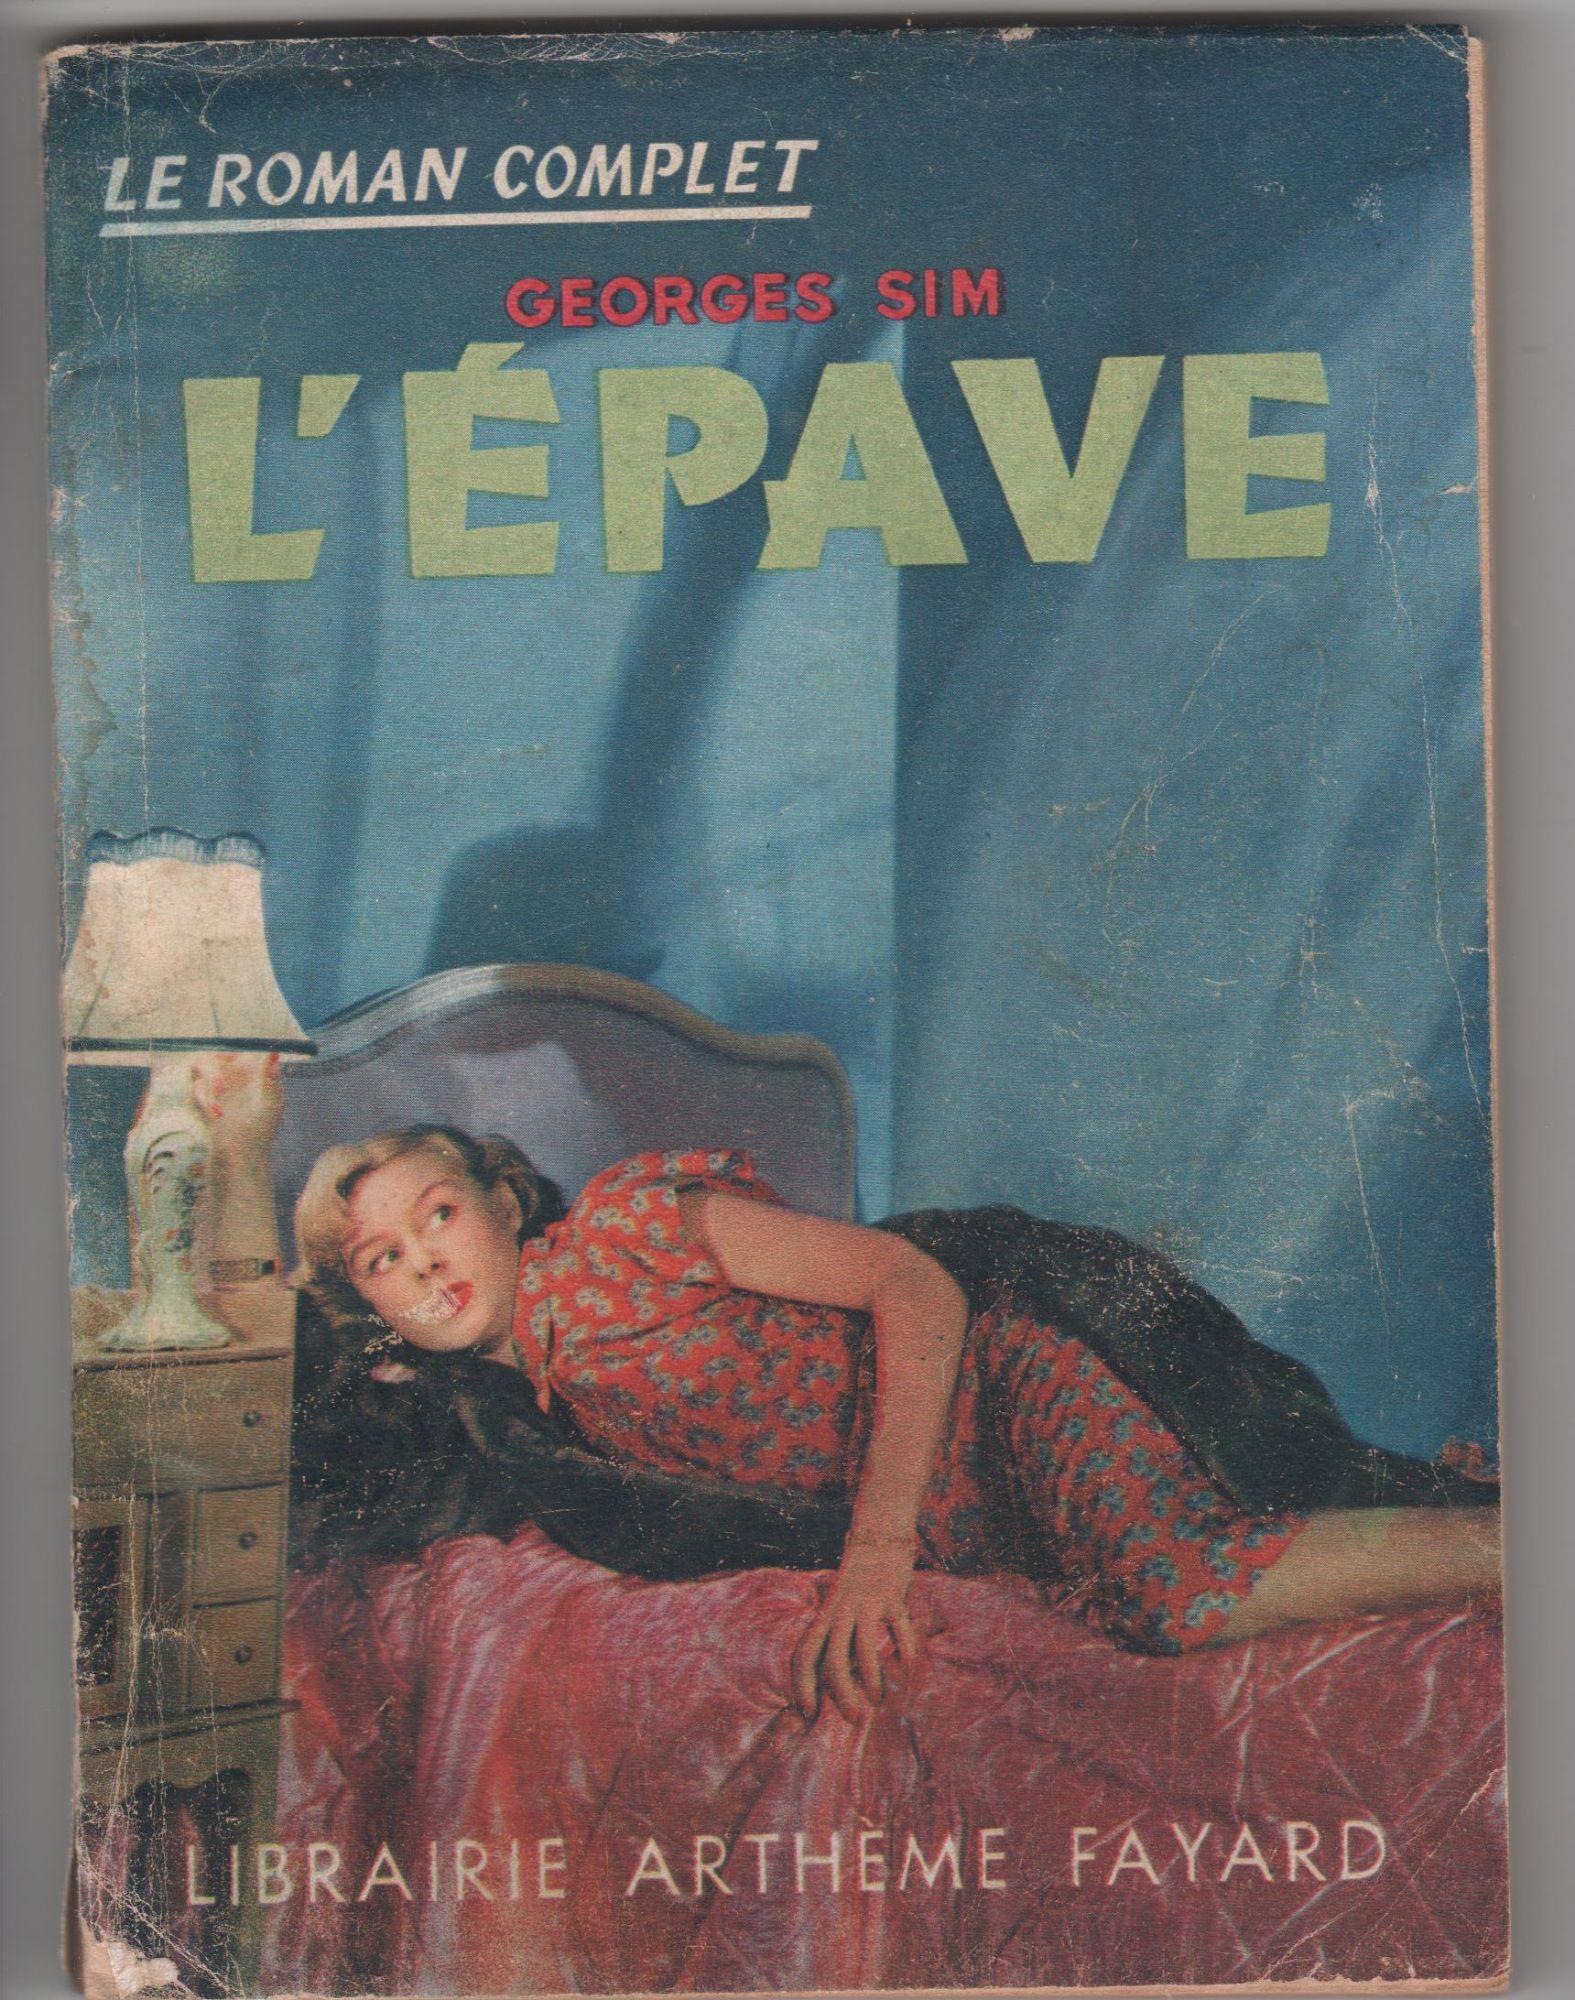 L'épave, pseudo: SIM, Arthème Fayard